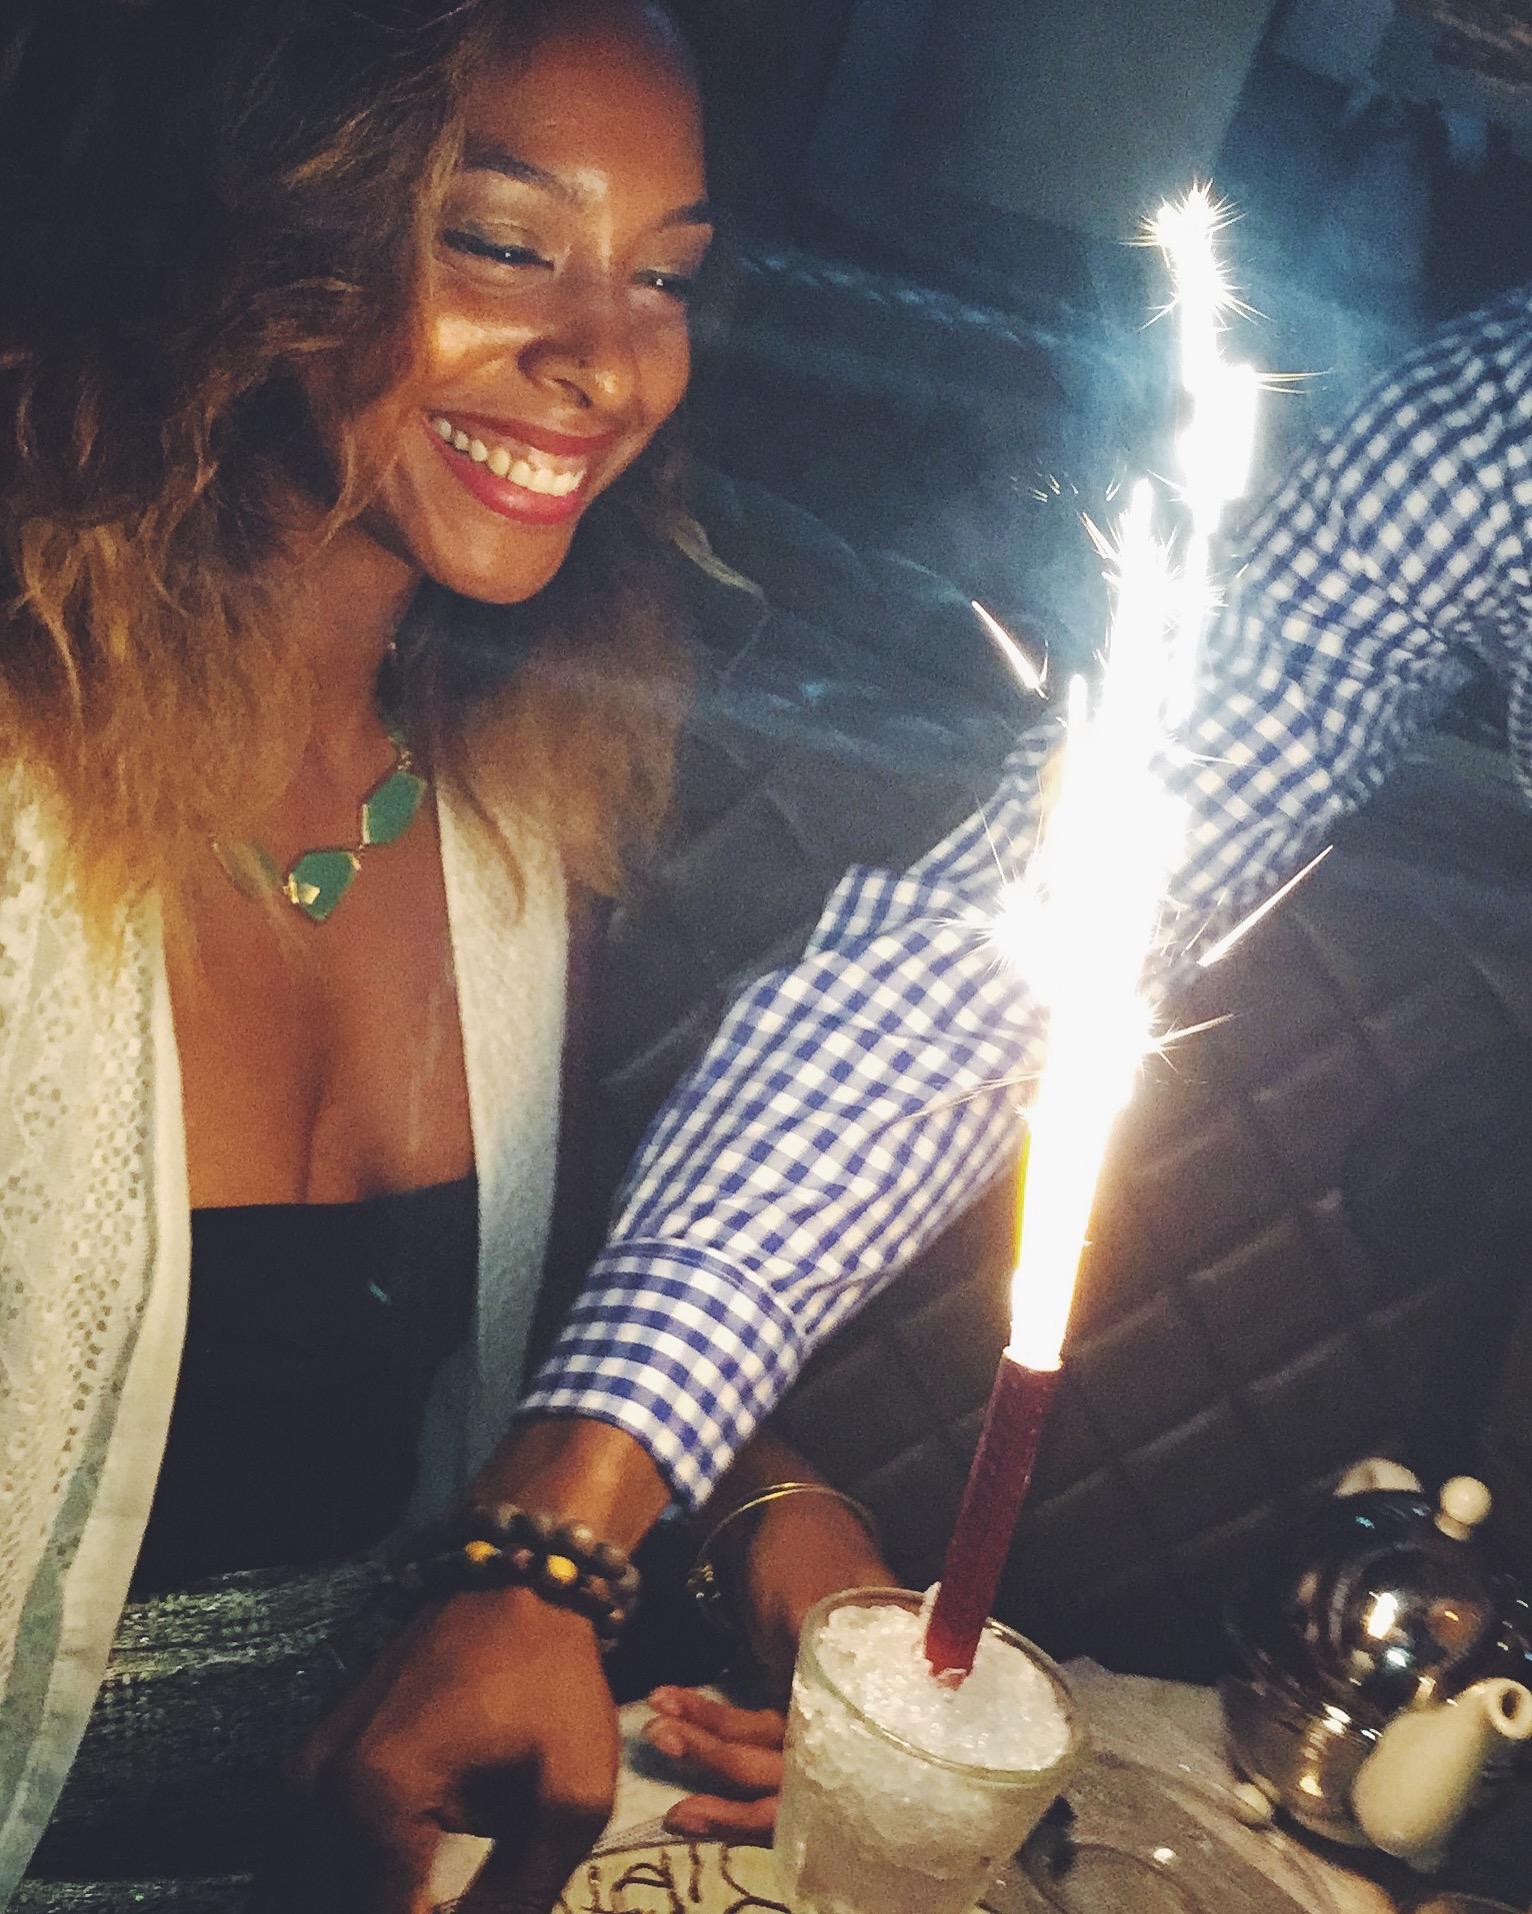 27th Birthday in Accra, Ghana